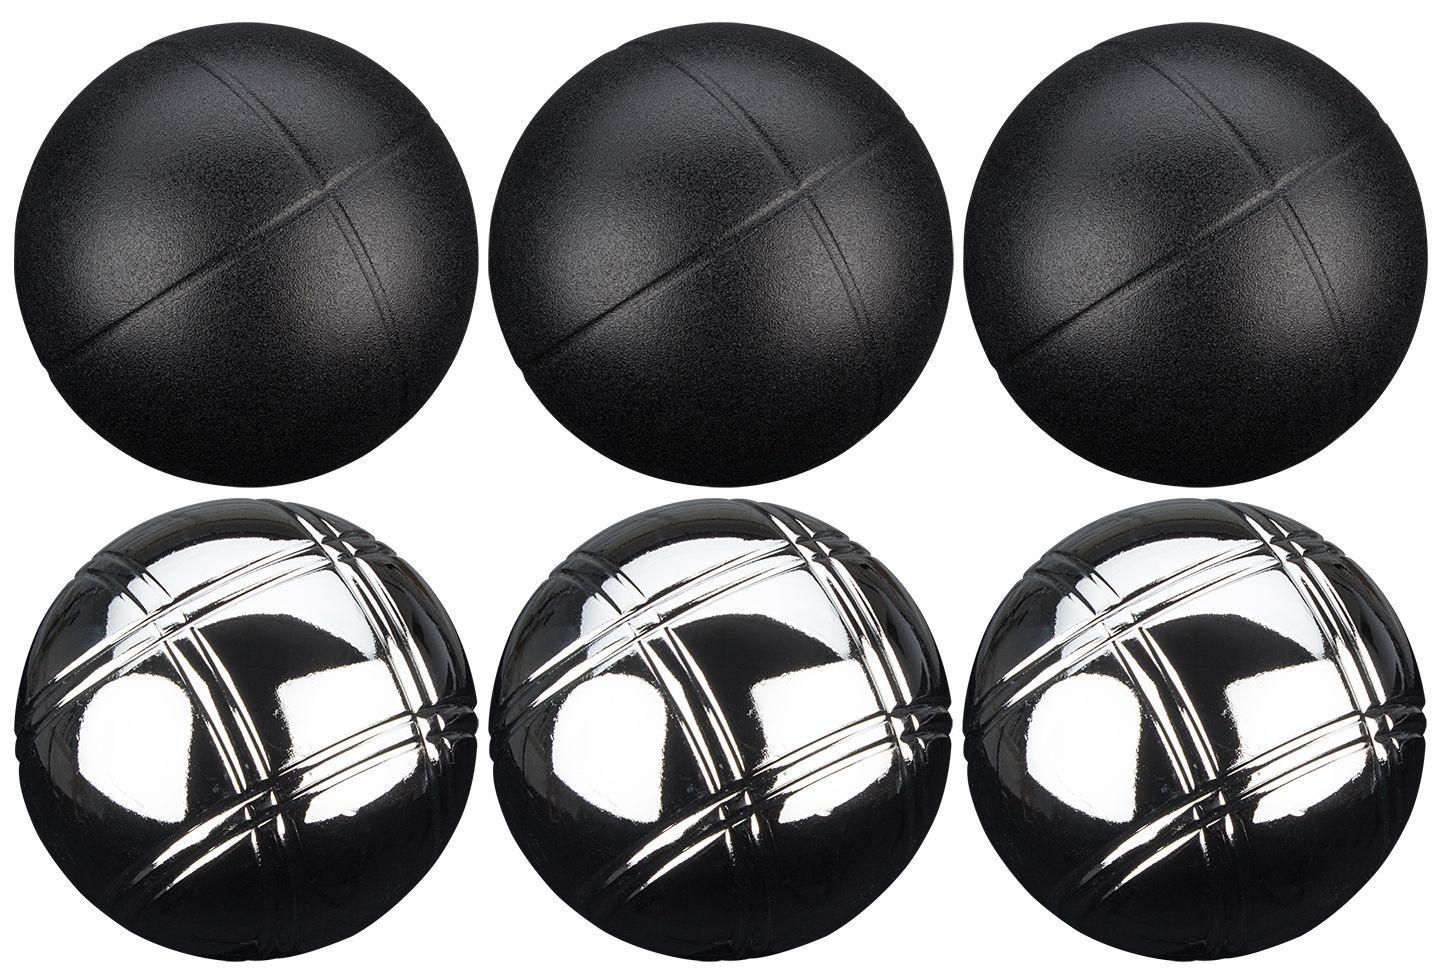 Jeu de Boules Set Luxe • 6 Ballen •